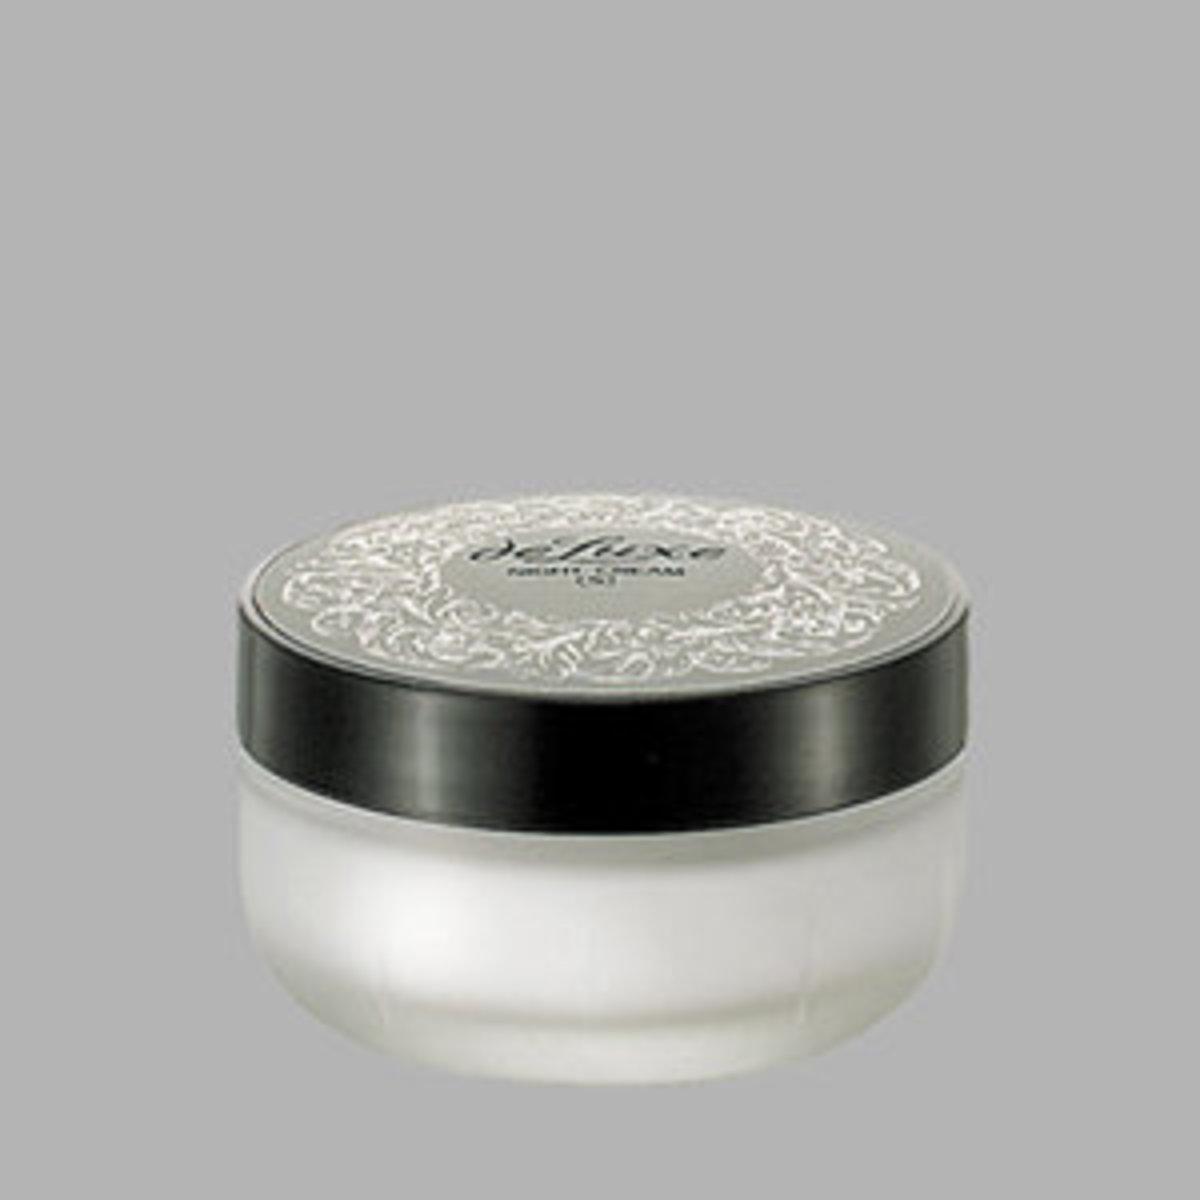 deluxe Night Cream (for oily skin) 50g